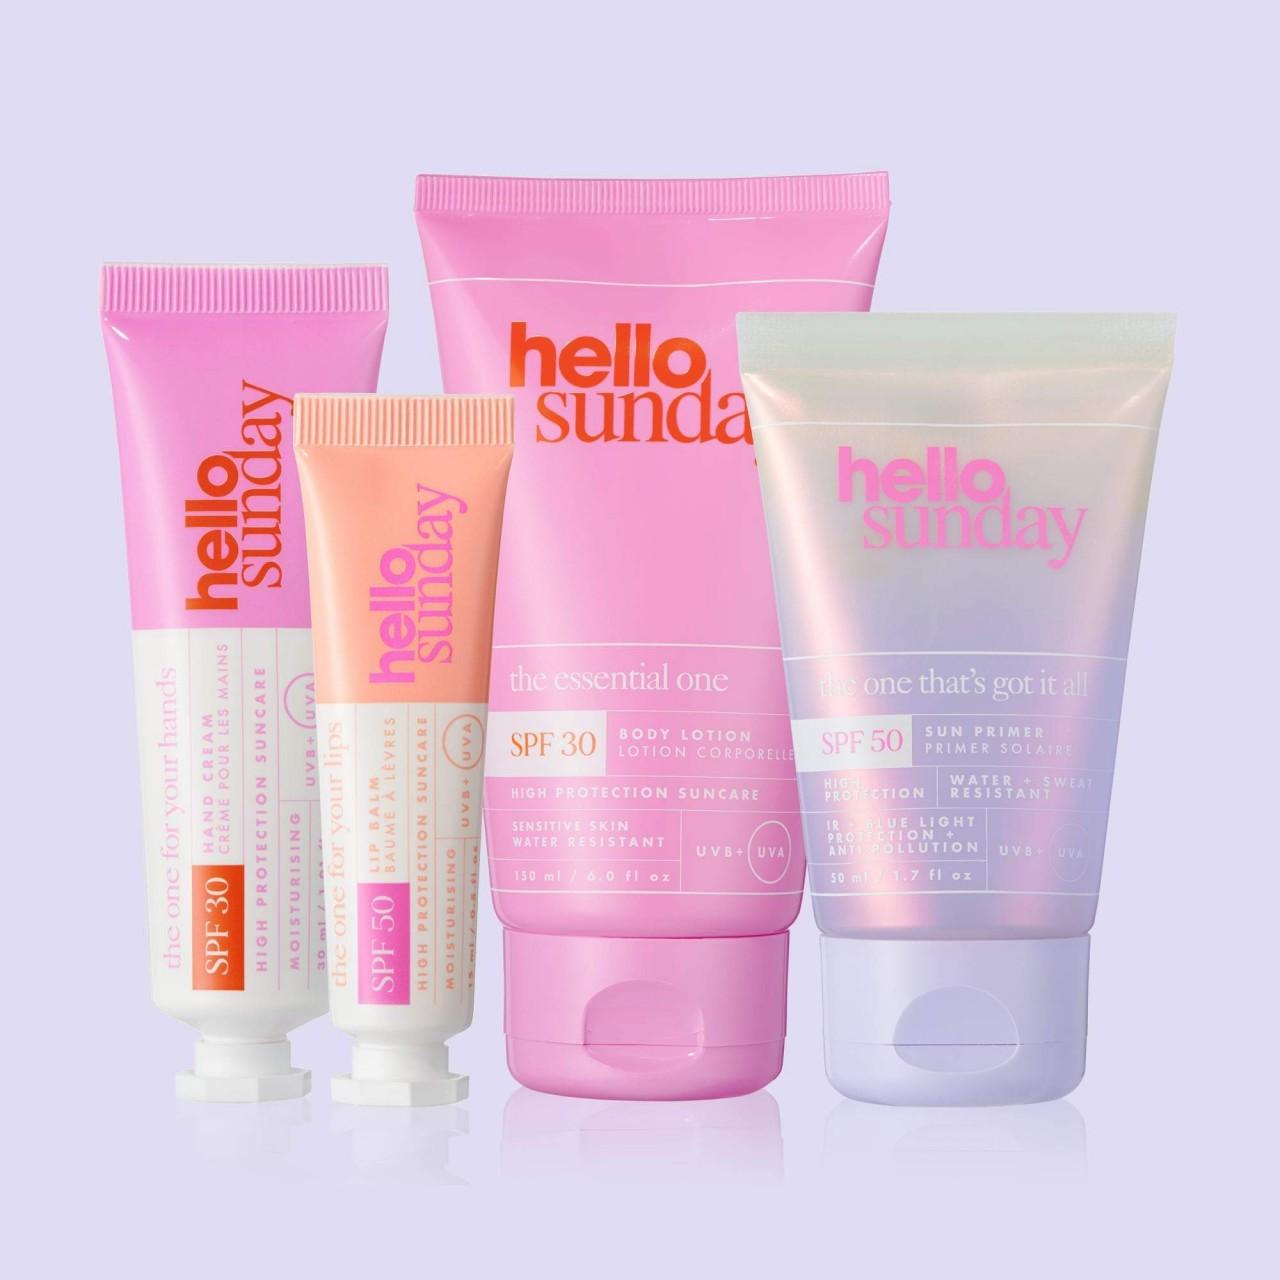 Санскрины Hello Sunday на BeautyBay и Cult Beauty